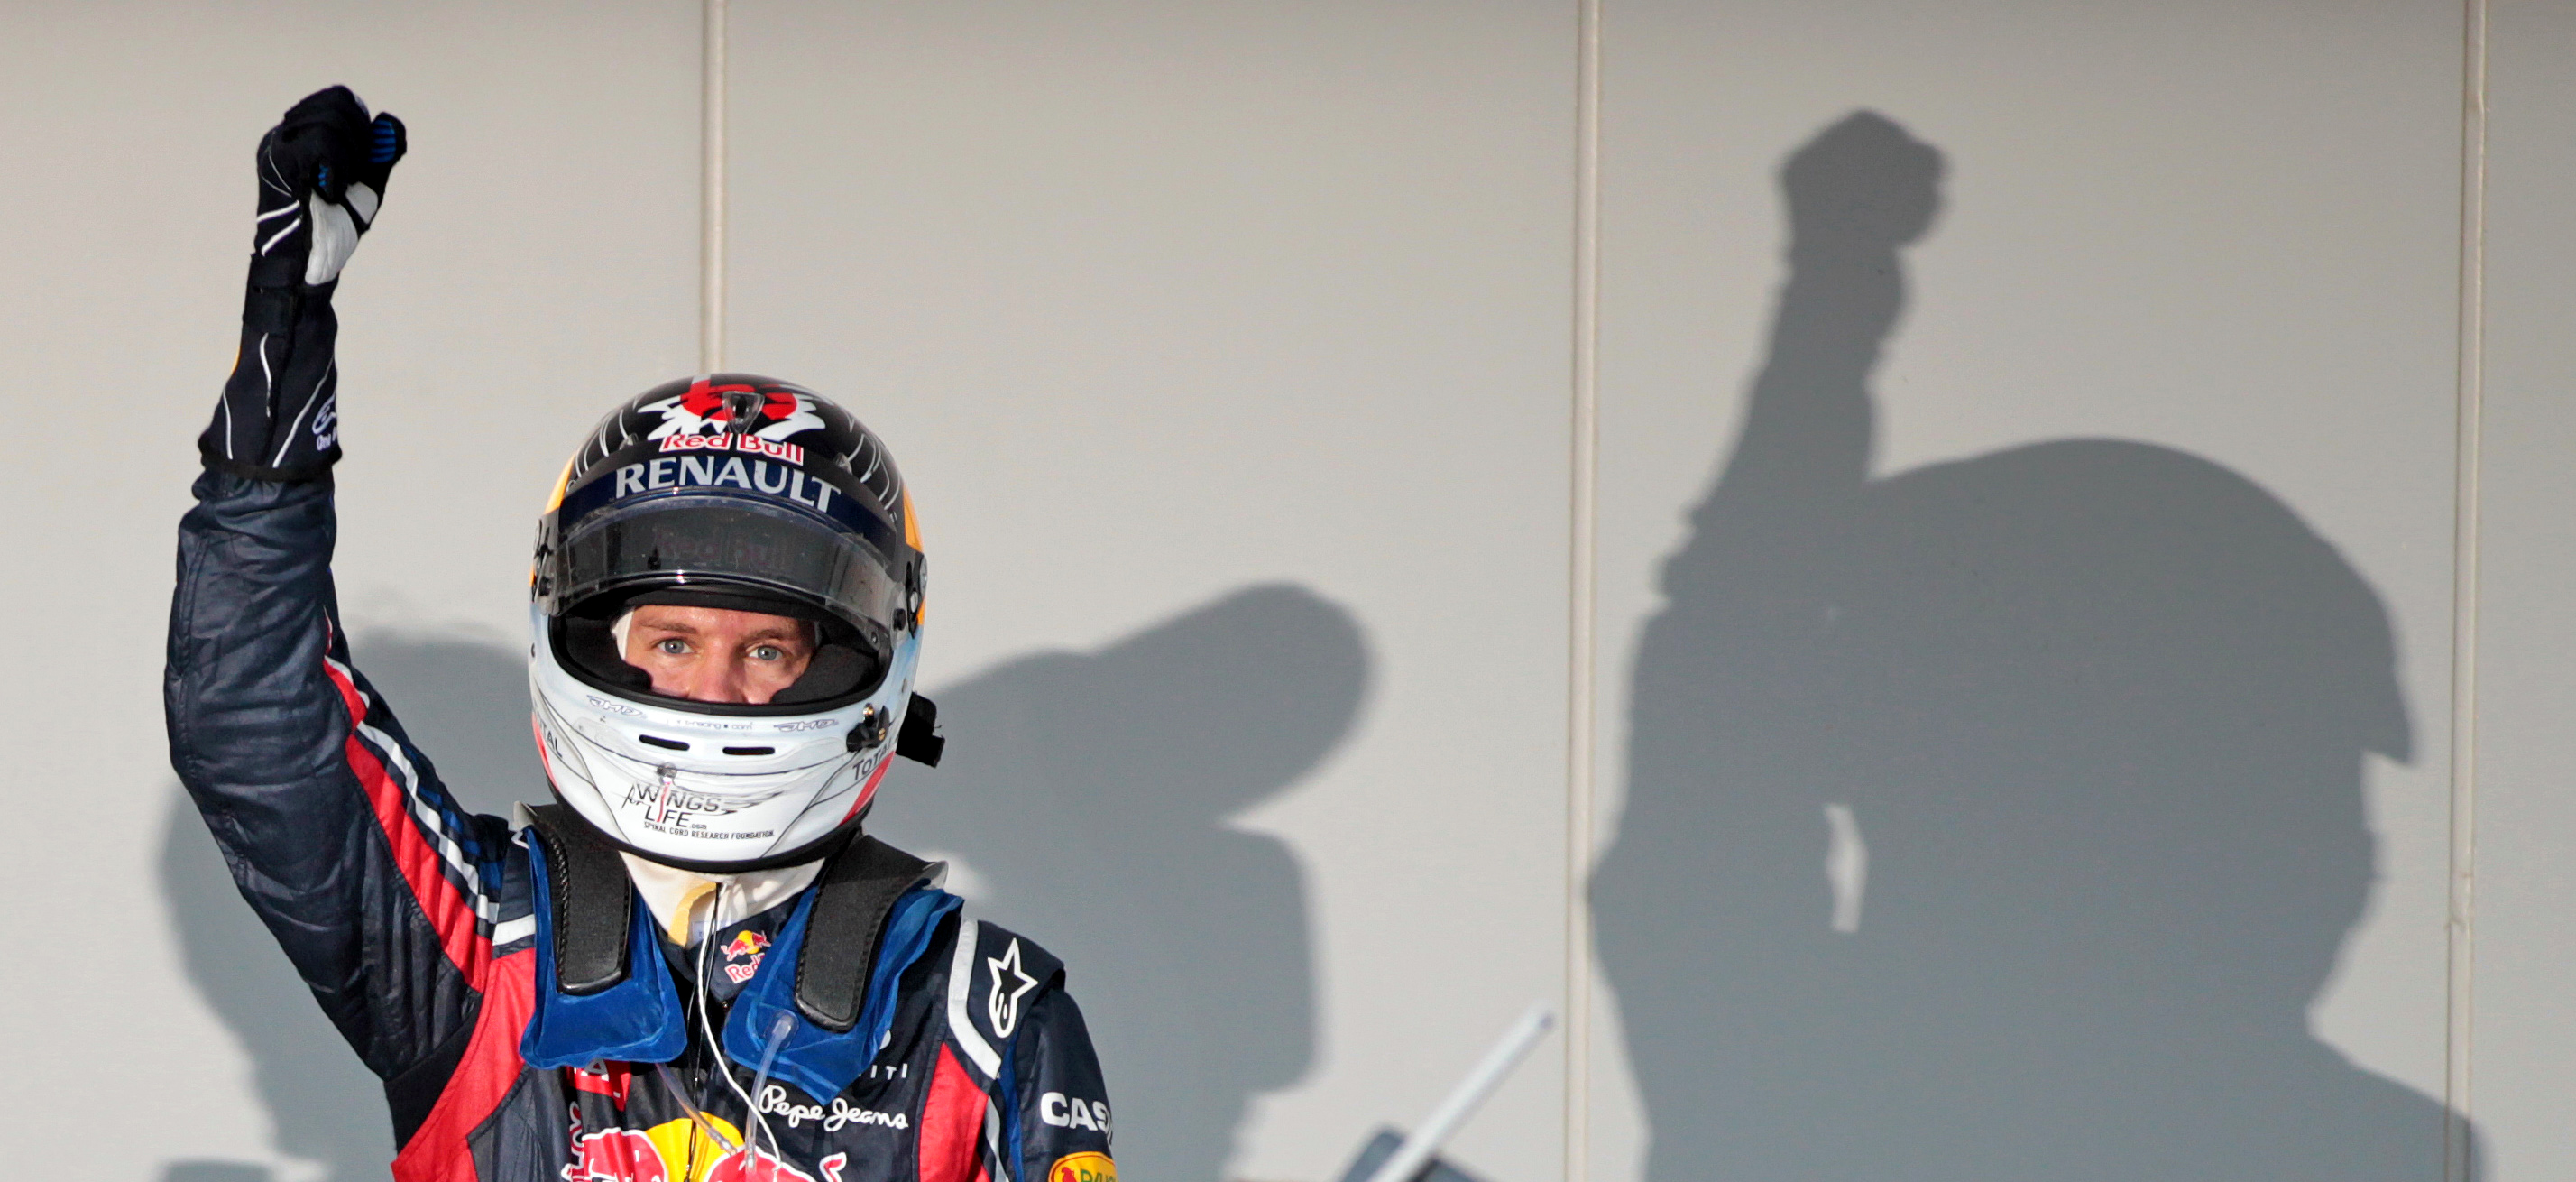 New Formula One champion German Sebastian Vettel of Red Bull cheers after the Japan Formula One Grand Prix at the Suzuka Circuit in Suzuka, Japan, 09 October 2011. Photo: Jan Woitas dpa